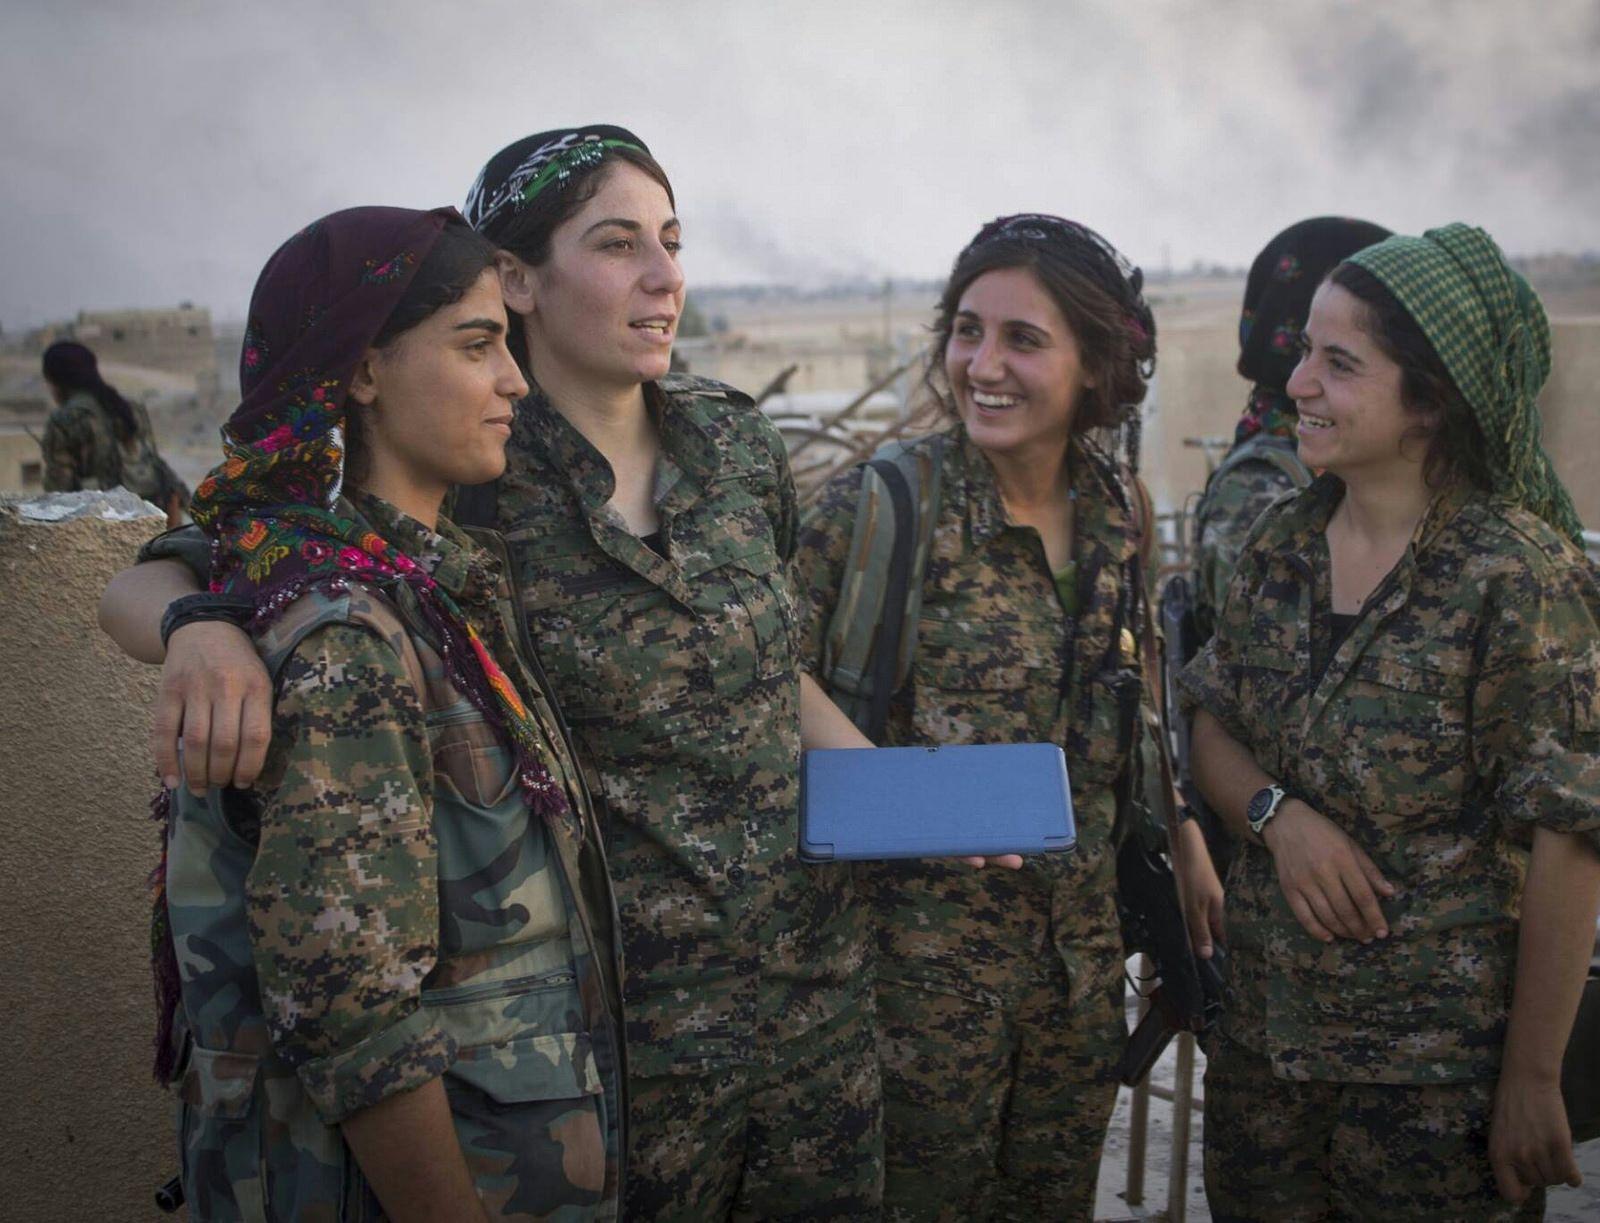 Kurdistan Warriors Female Fighter Female Soldier Kurdistan